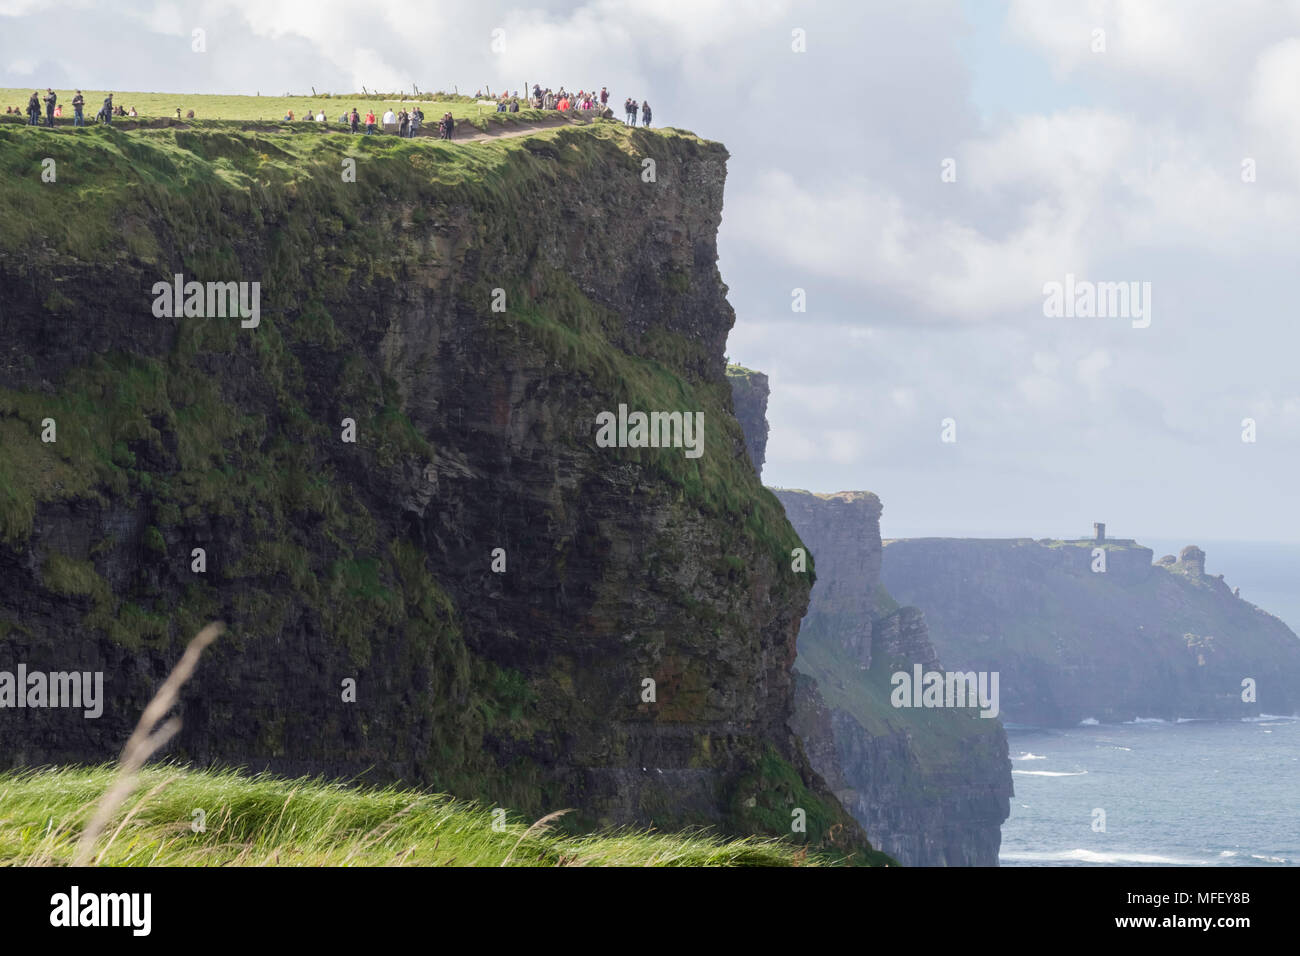 Cliffs of Moher, Ireland, Europe, closeup, tourists, daylight, clouds - Stock Image